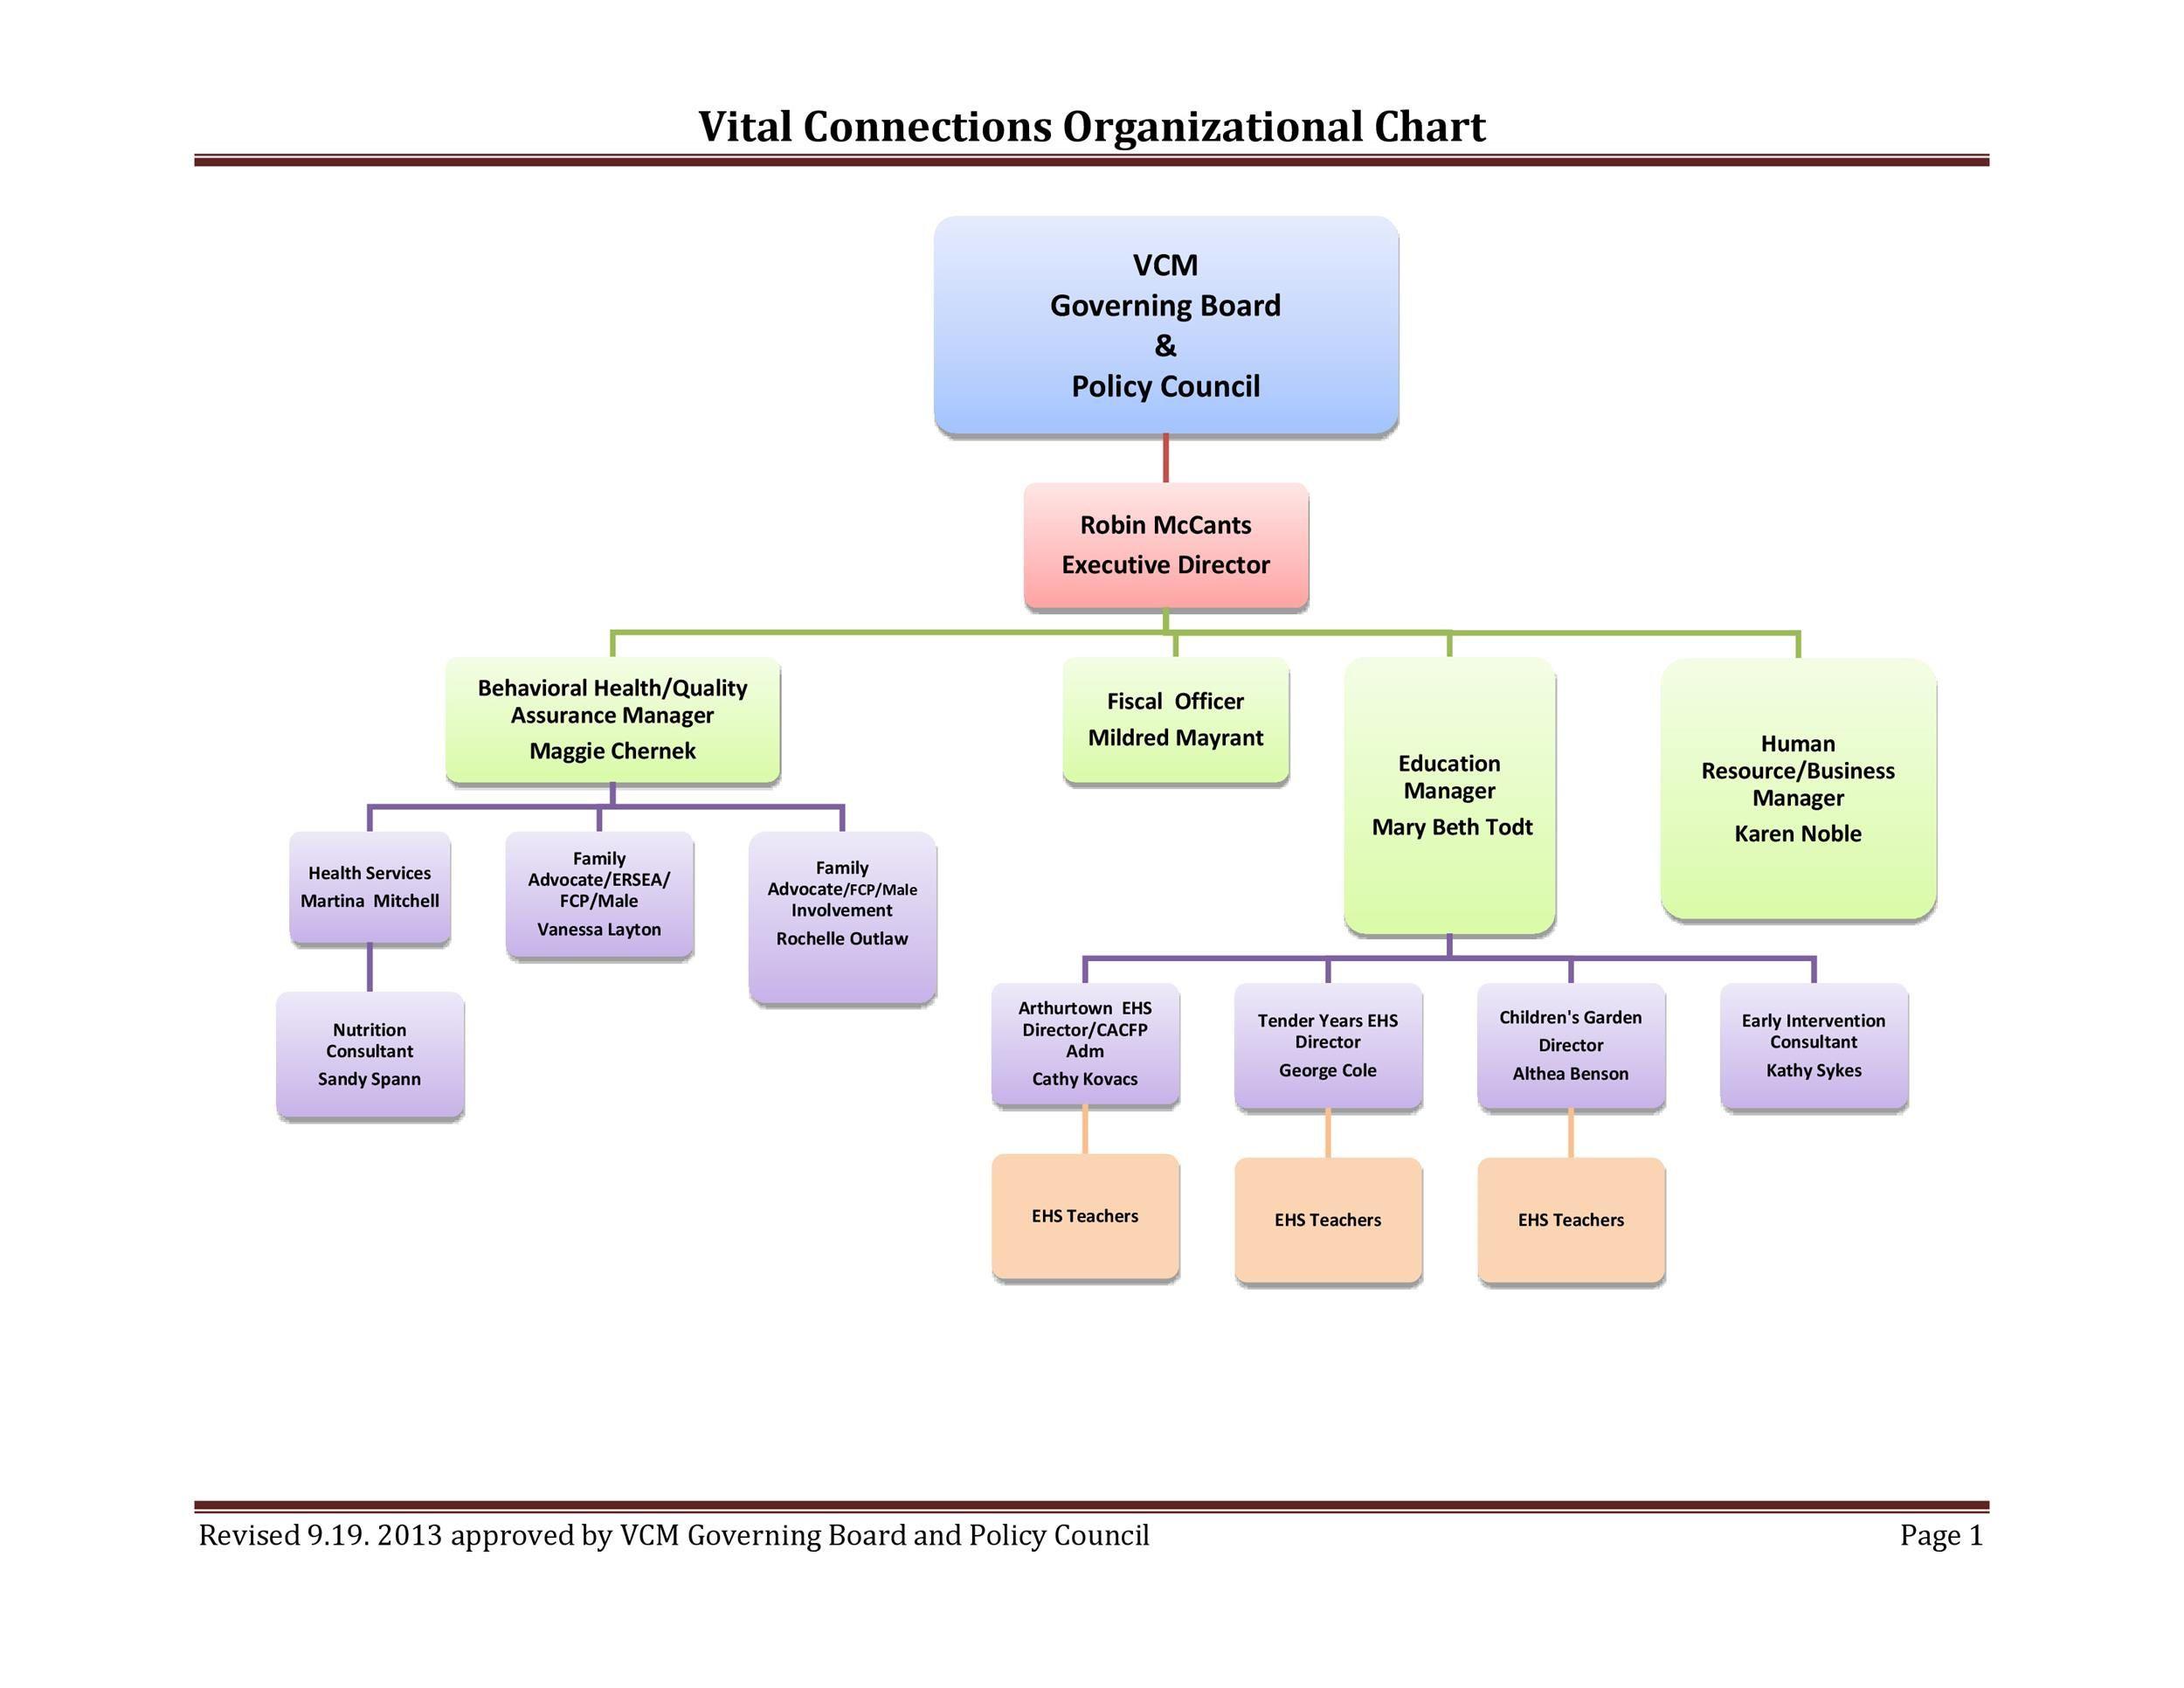 006 Beautiful Free Organizational Chart Template Excel 2010 Idea Full